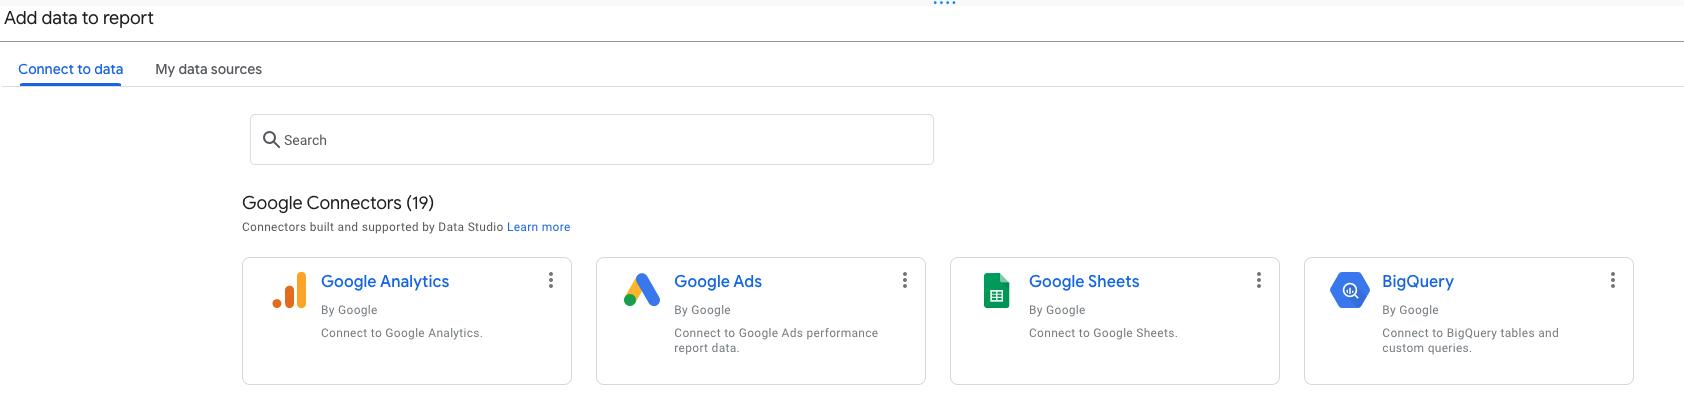 Adding Velocity Data Link as Data Source in Google Data Studio